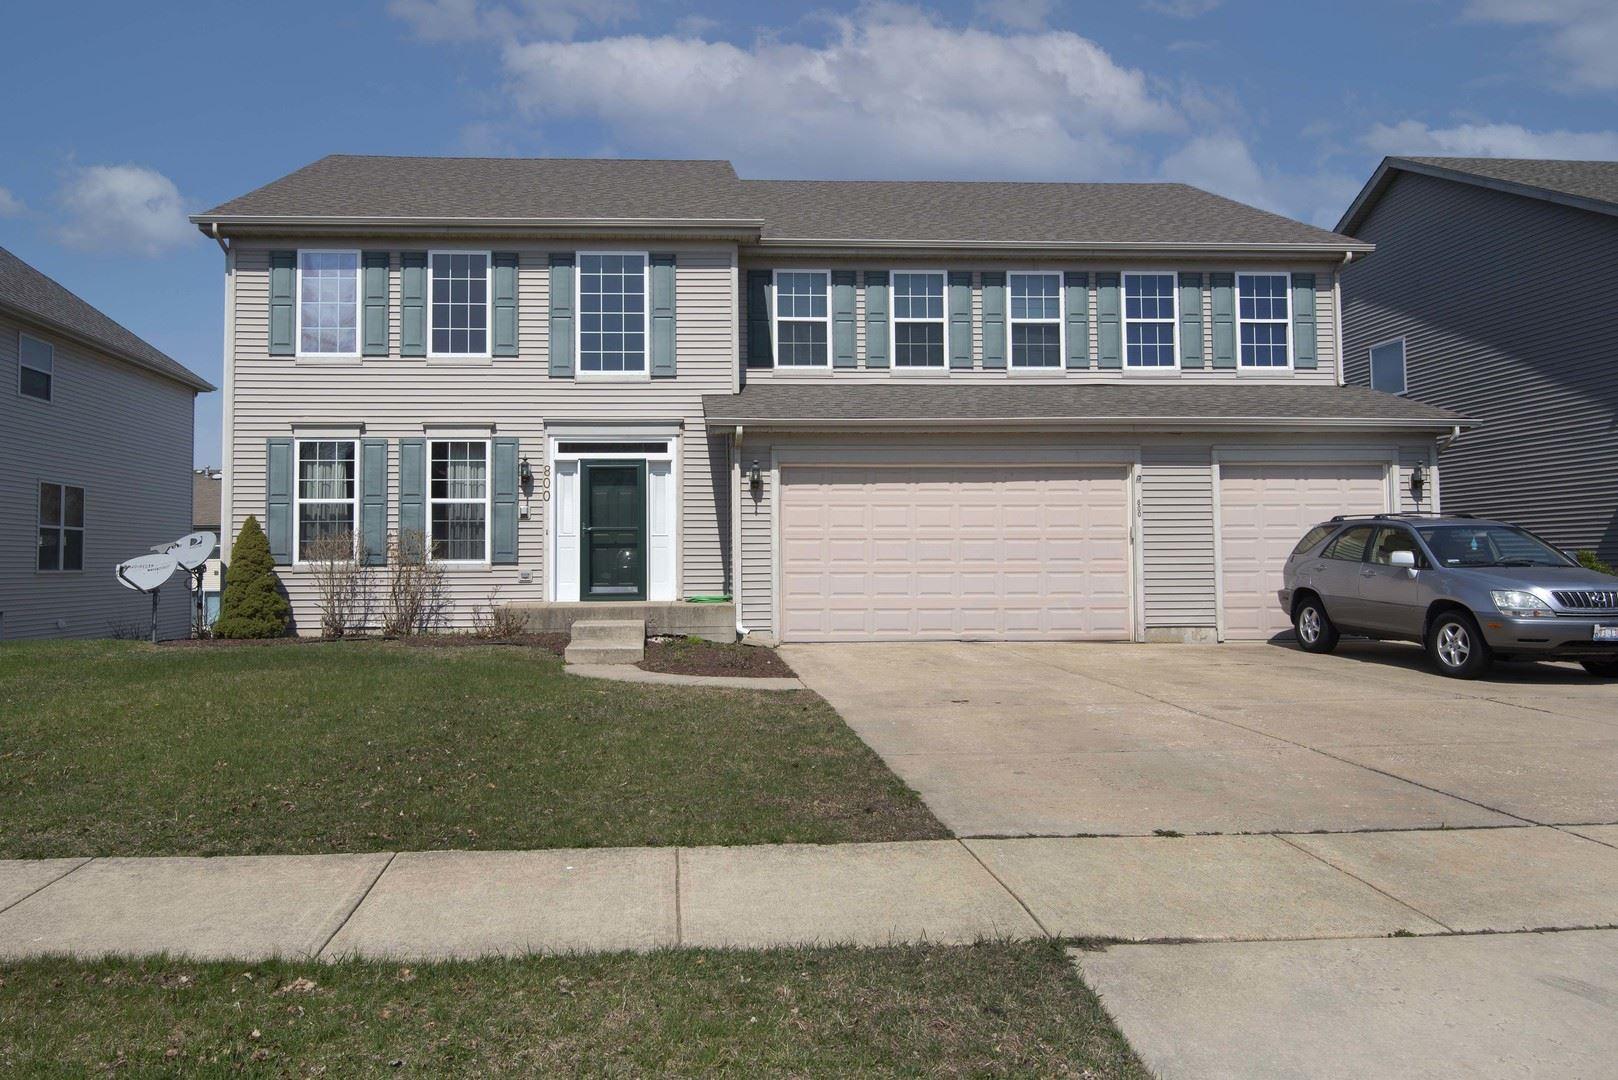 Photo of 800 Brompton Lane, Bolingbrook, IL 60440 (MLS # 11044958)